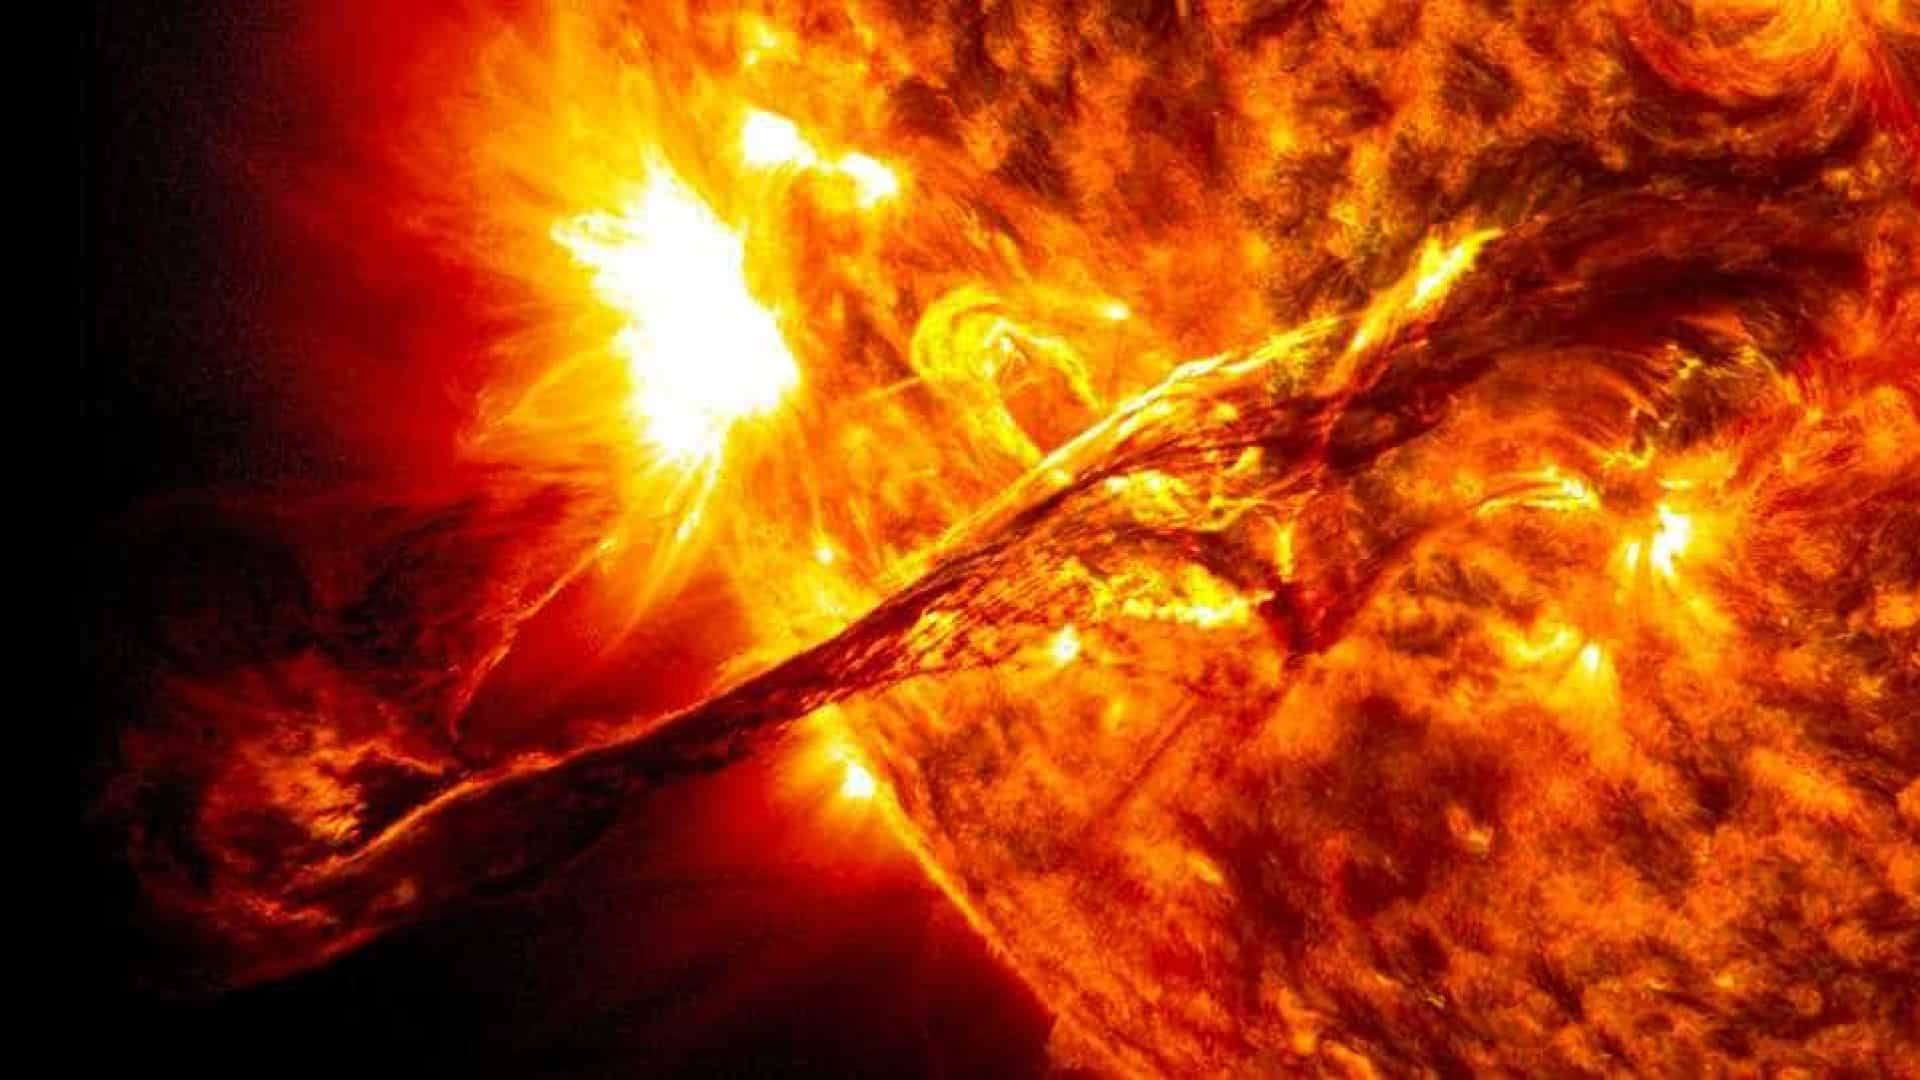 Tempestade magnética inesperada deixa cientistas perplexos